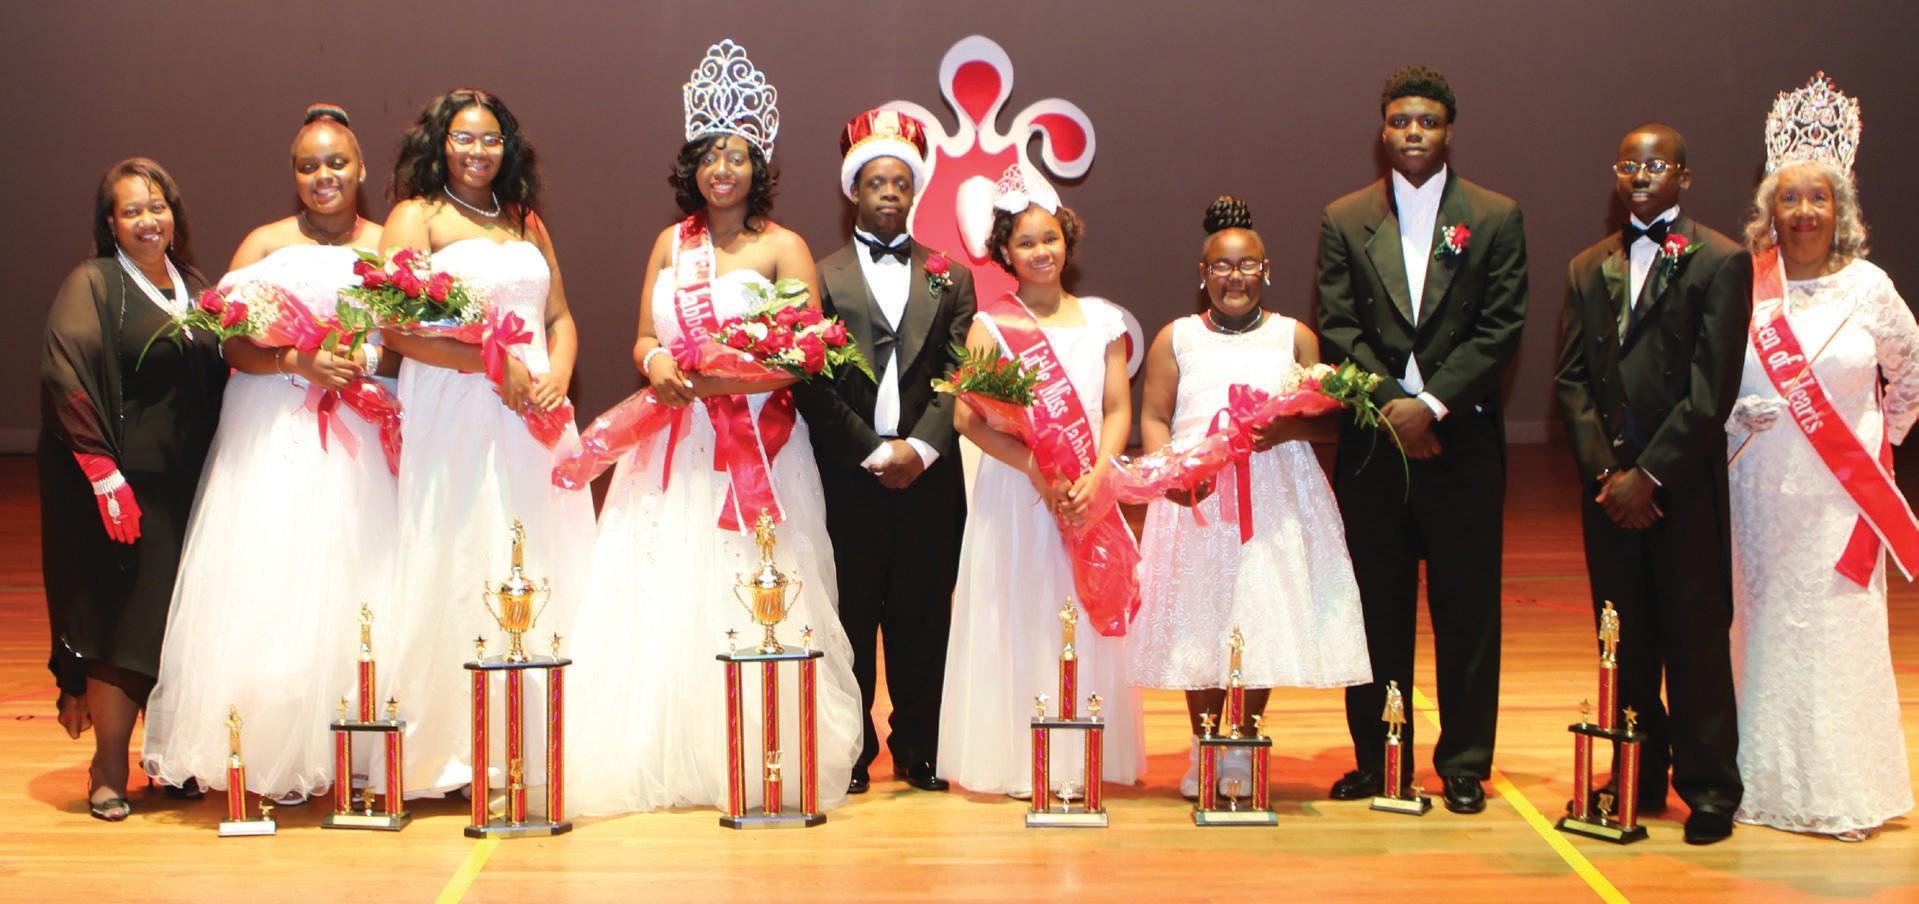 L-R: Laura N. Wiggins, Savannah Alumnae Chapter President; Kennedy Ingram, 2nd Runner Up, Little Miss Jabberwock; Petra Albright, 1st Runner Up, Miss Jabberwock; Cierra Warren, Miss Jabberwock; Clorenzo Griffin, Jr. Mr. Jabberwock; Katlin Brown, Little Miss Jabberwock; Kia Mustopher, 1st Runner Up, Little Miss Jabberwock; Benjamin Smith, 2nd Runner Up, Mr. Jabberwock; Kyem Robbins, 1st Runner Up, Mr. Jabberwock; Margurite Birt, Queen of Hearts